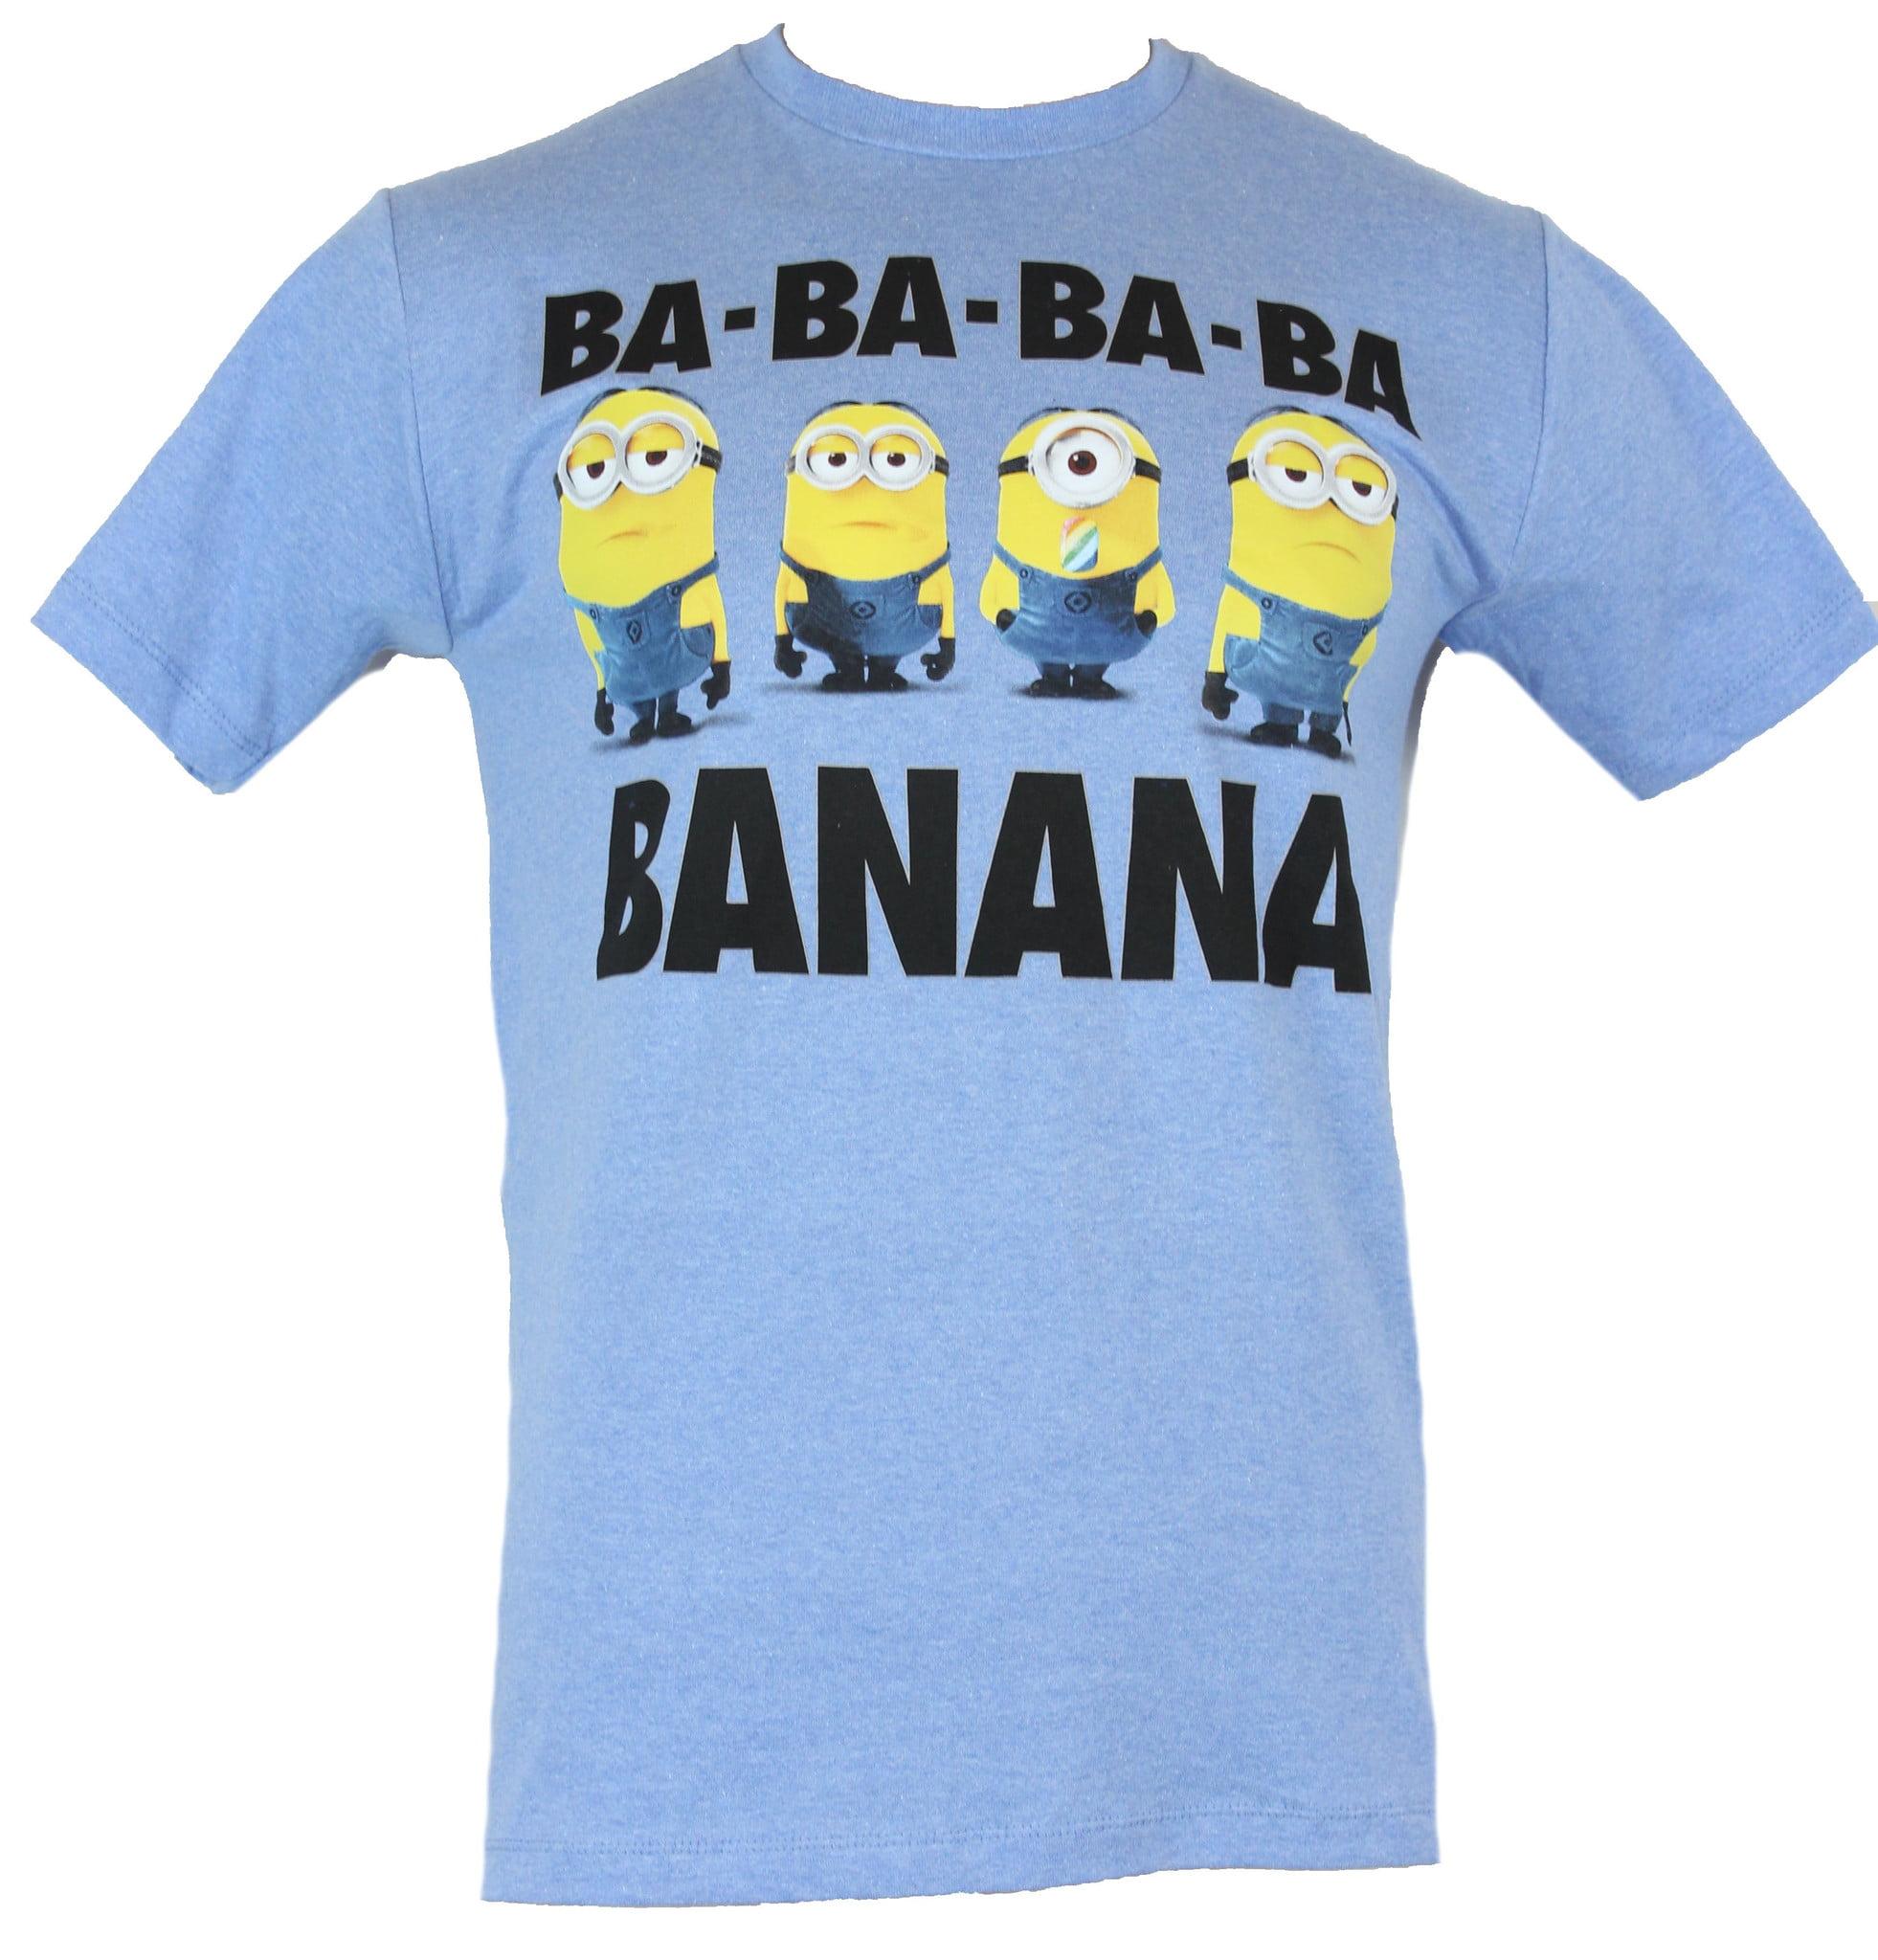 S T-Shirt con motivo Keep Calm and Eat a Banana tratto da Cattivissimo Me- Motivo di Kevin Blu Minions